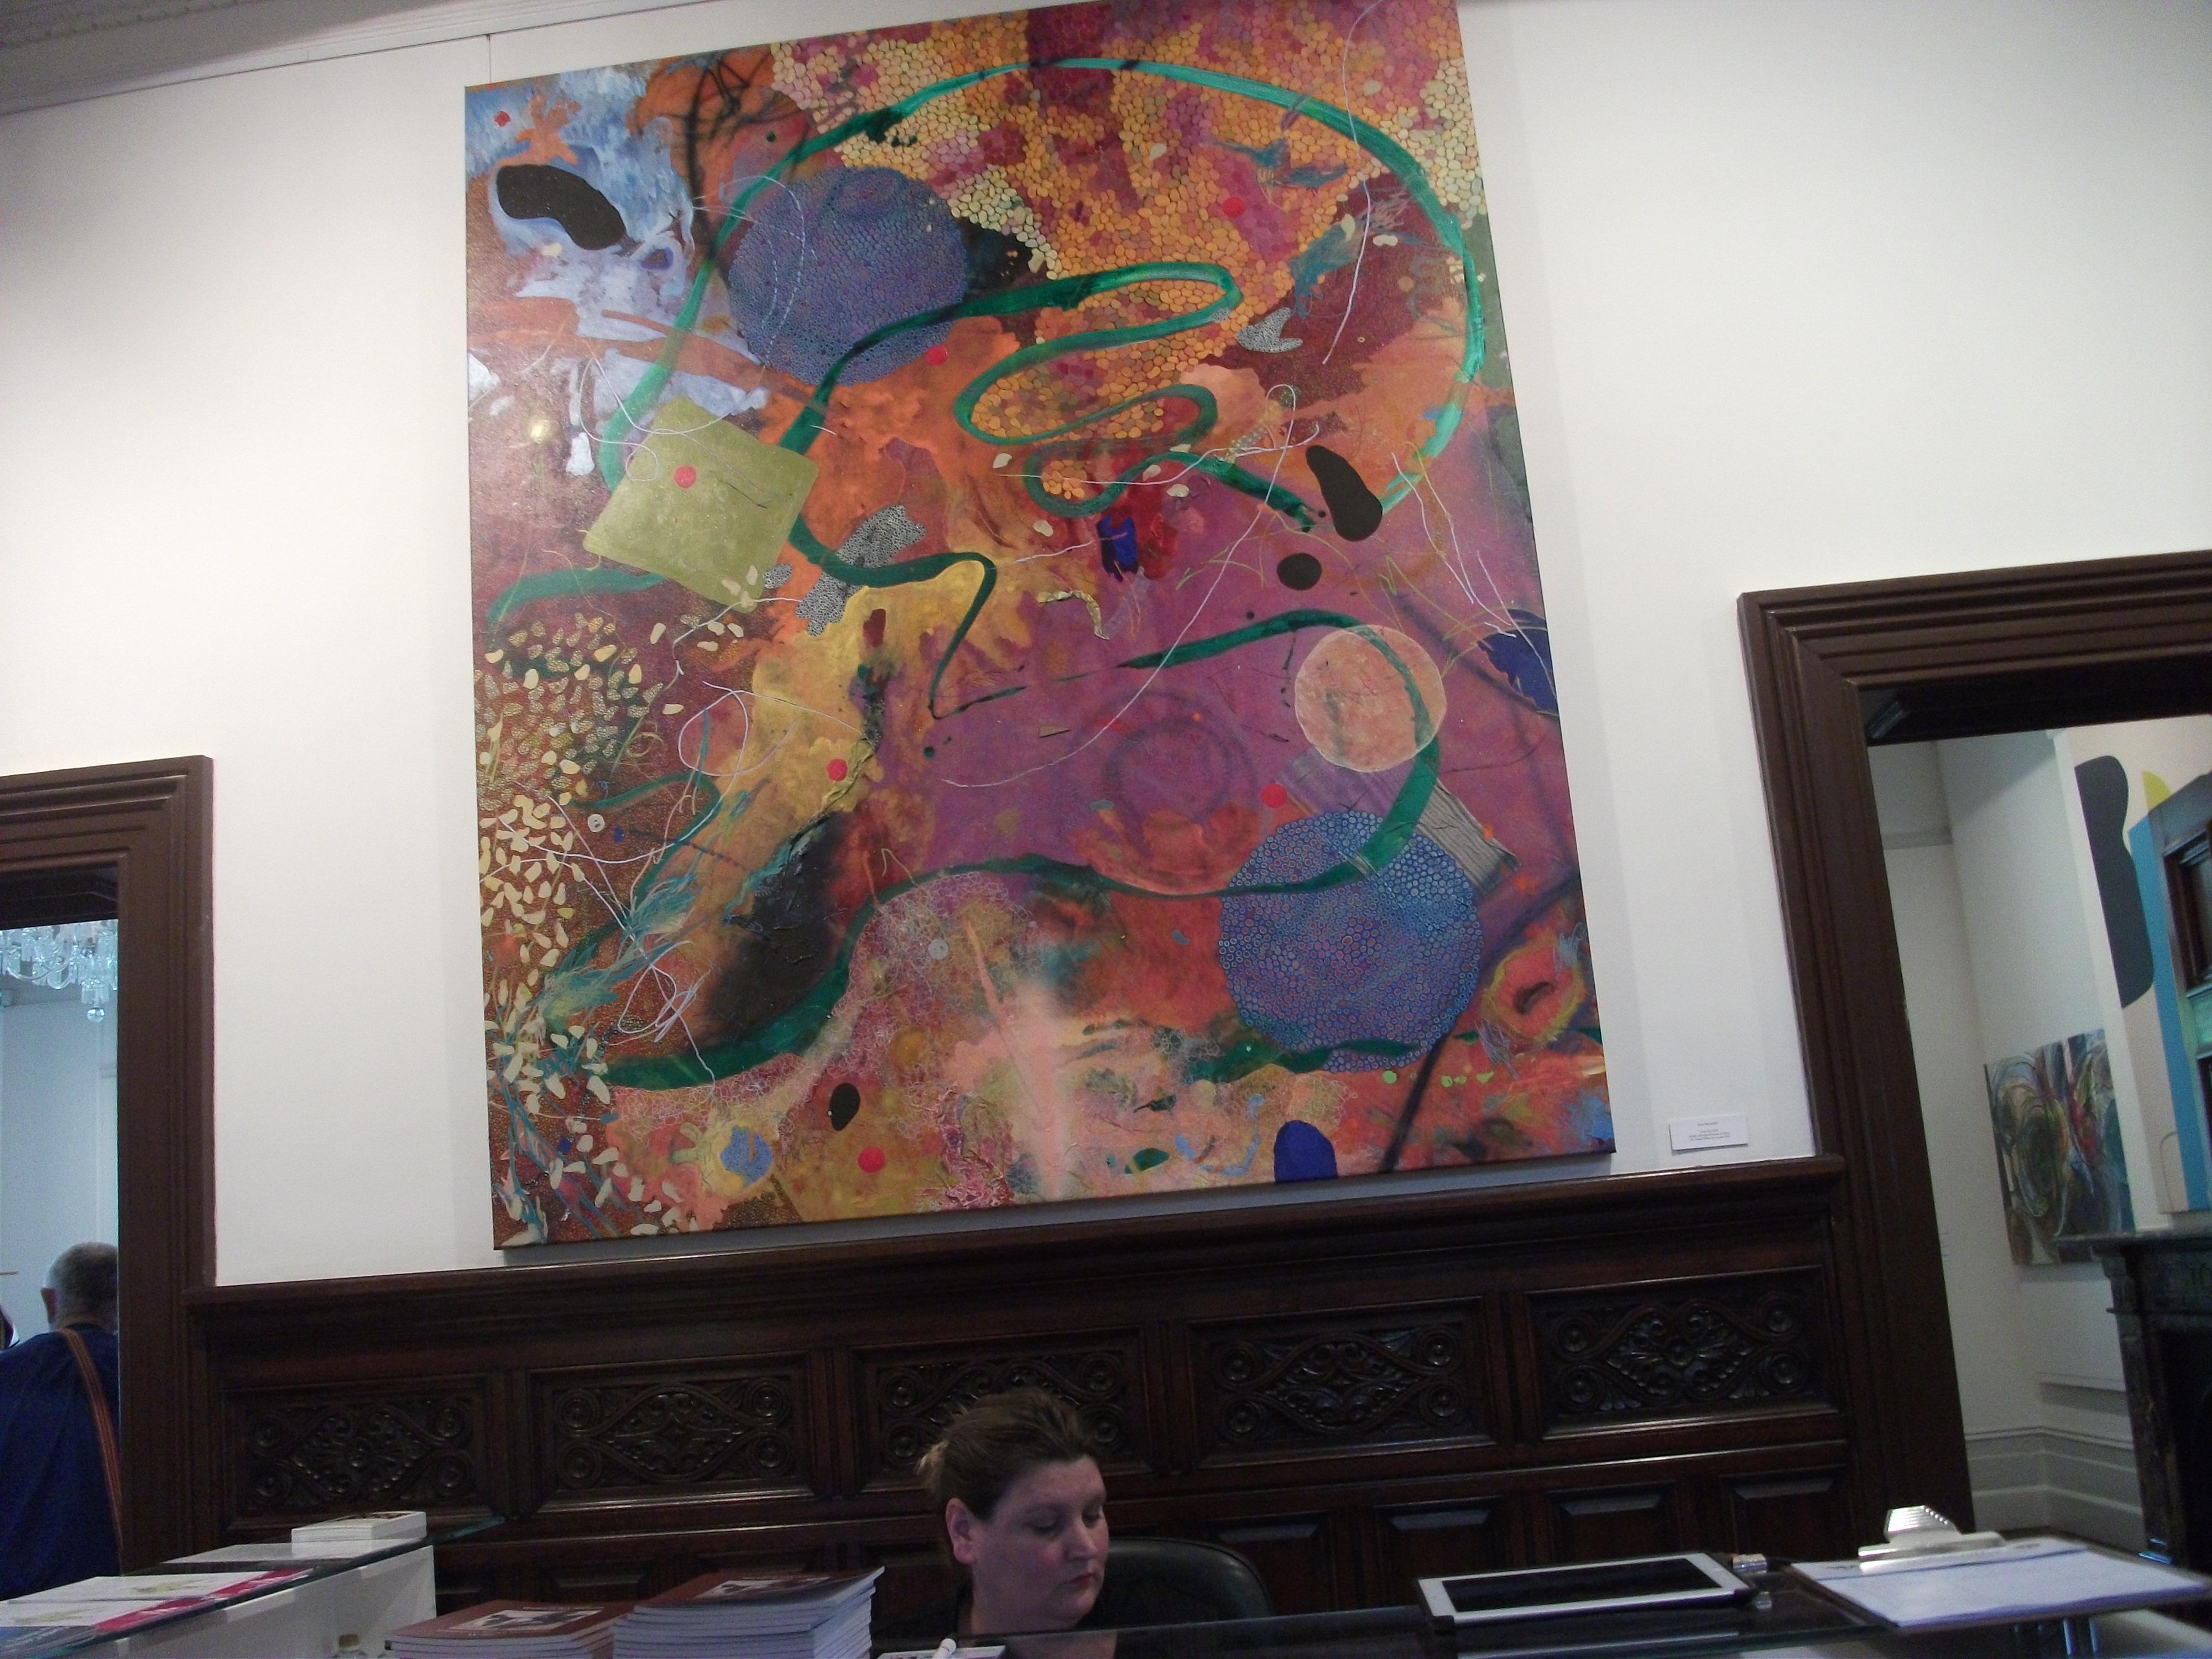 An art displayed in Auckland Art galler Exhibit